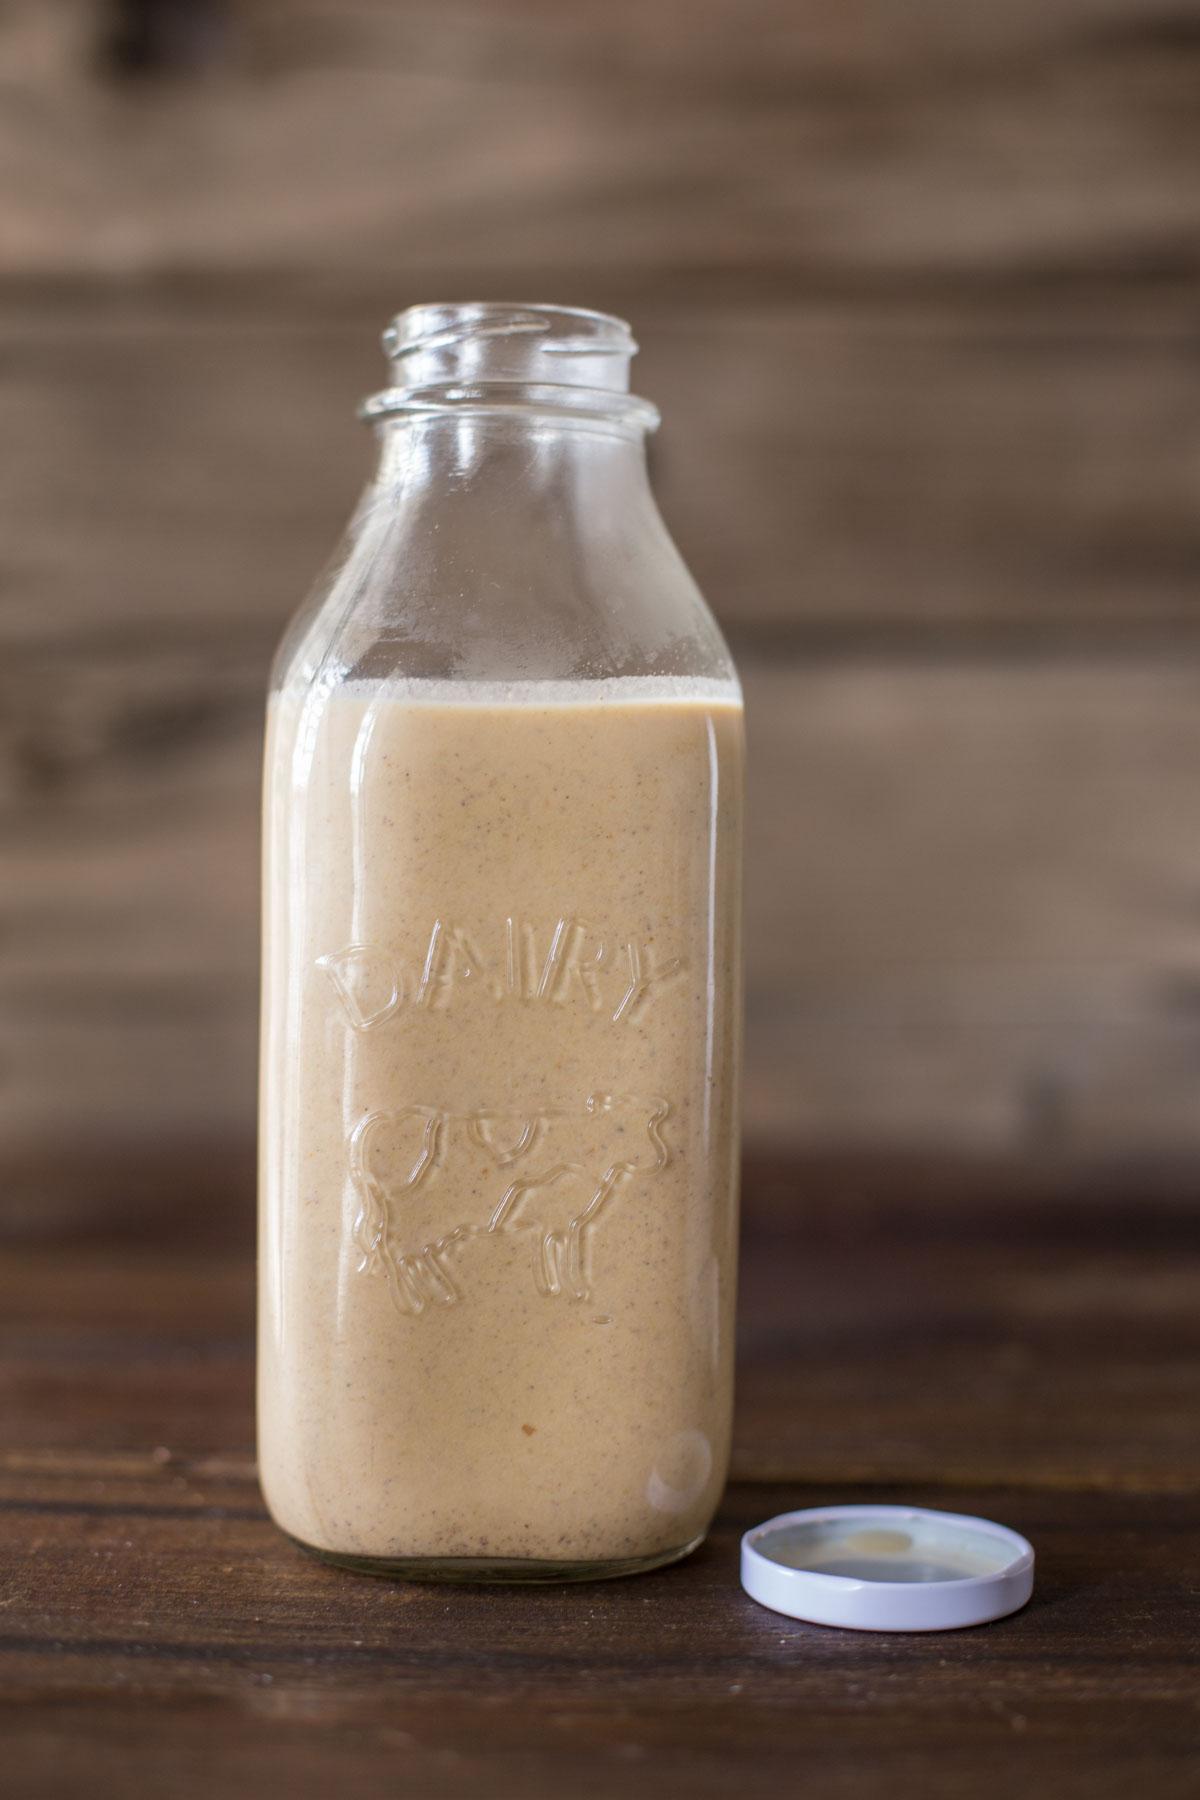 Homemade Pumpkin Spice Coffee Creamer in a glass jar.